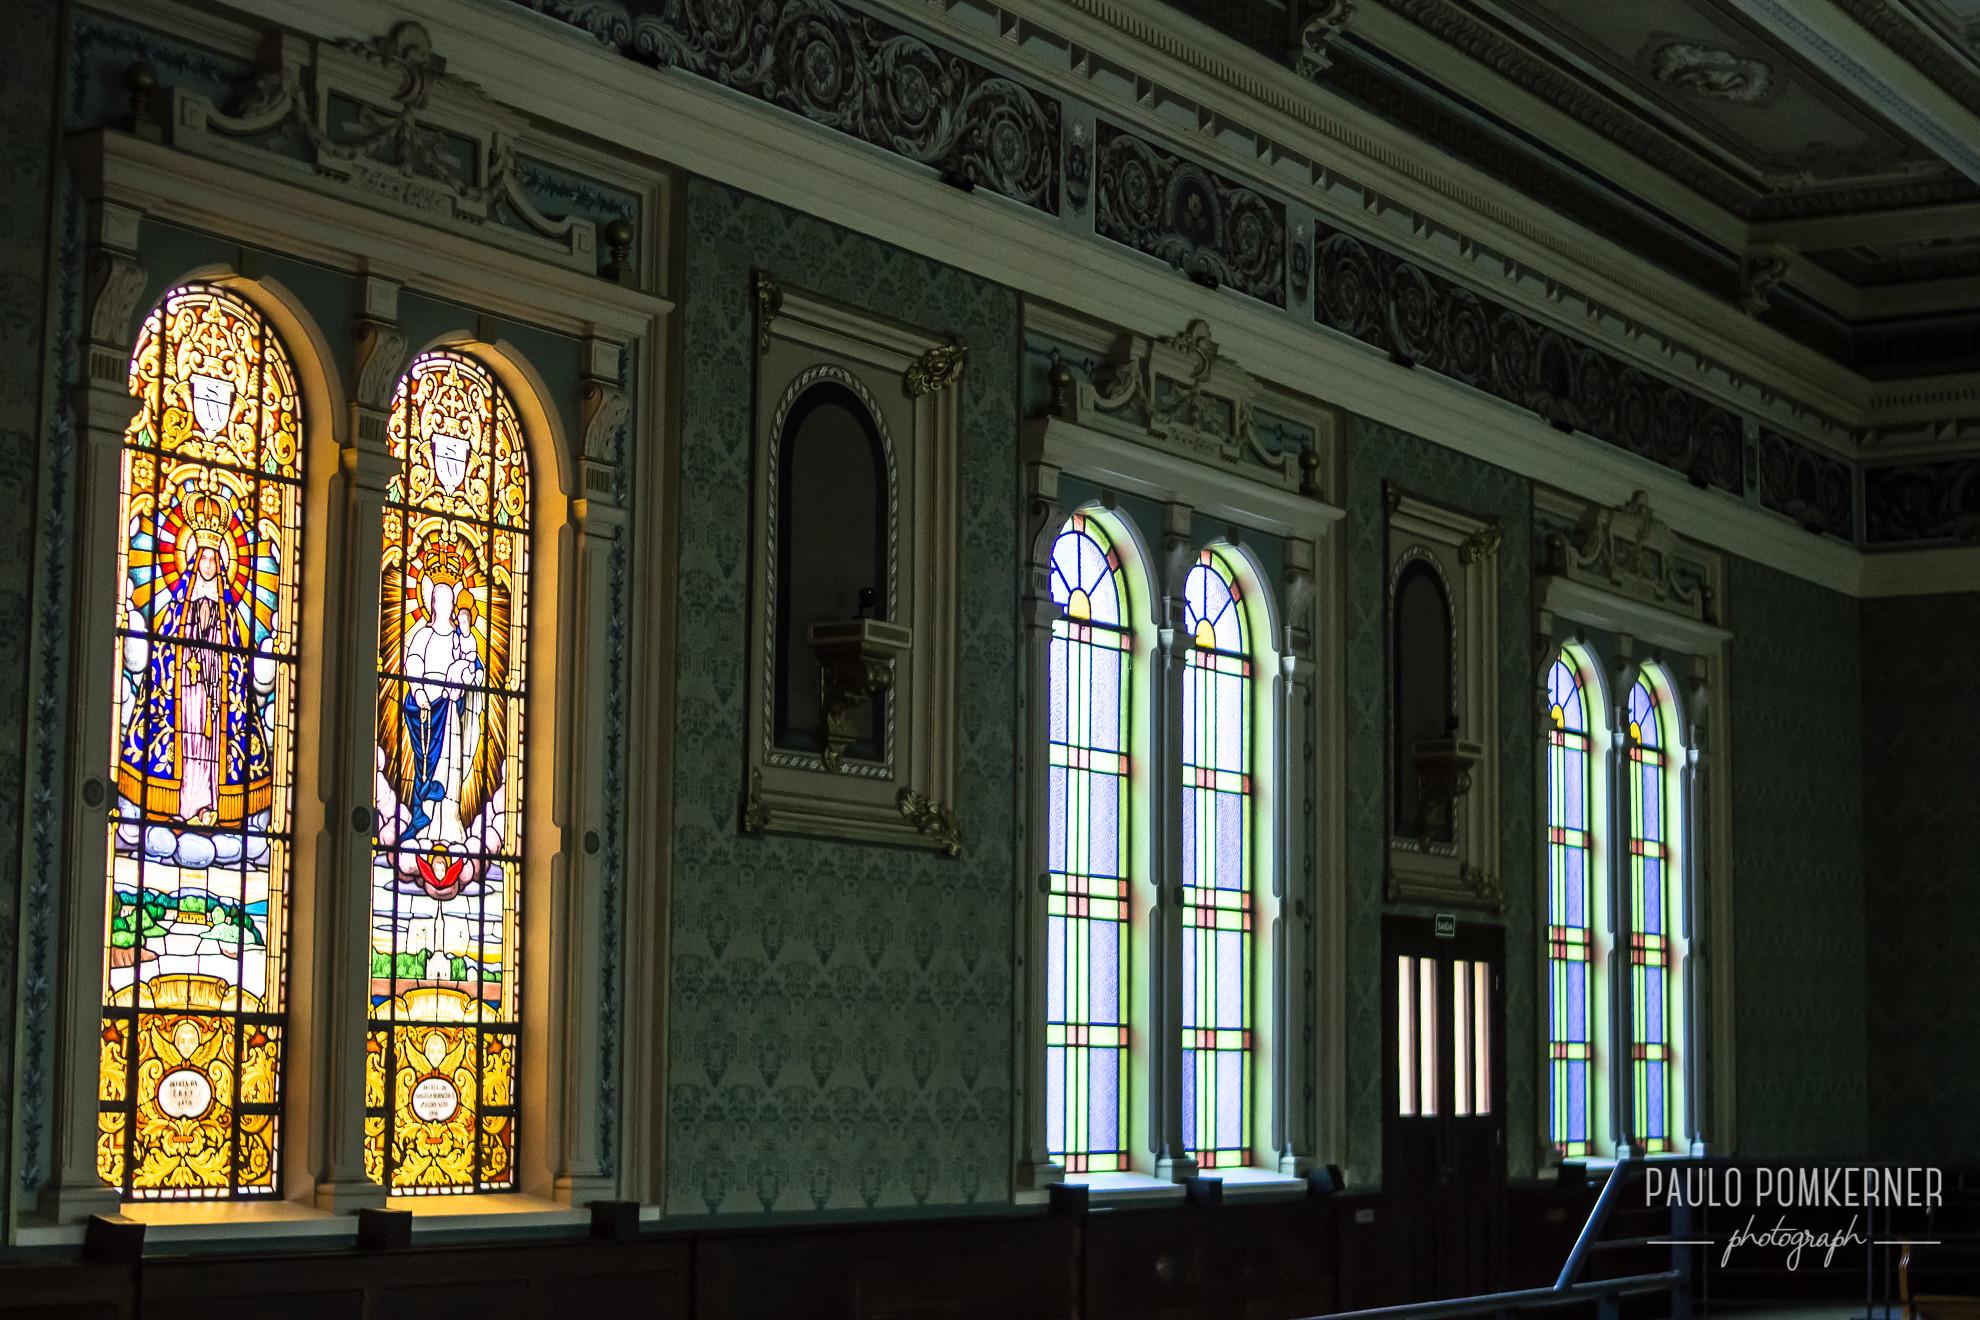 abre-la-ventana-blog-paulo-pomkerner-photograph